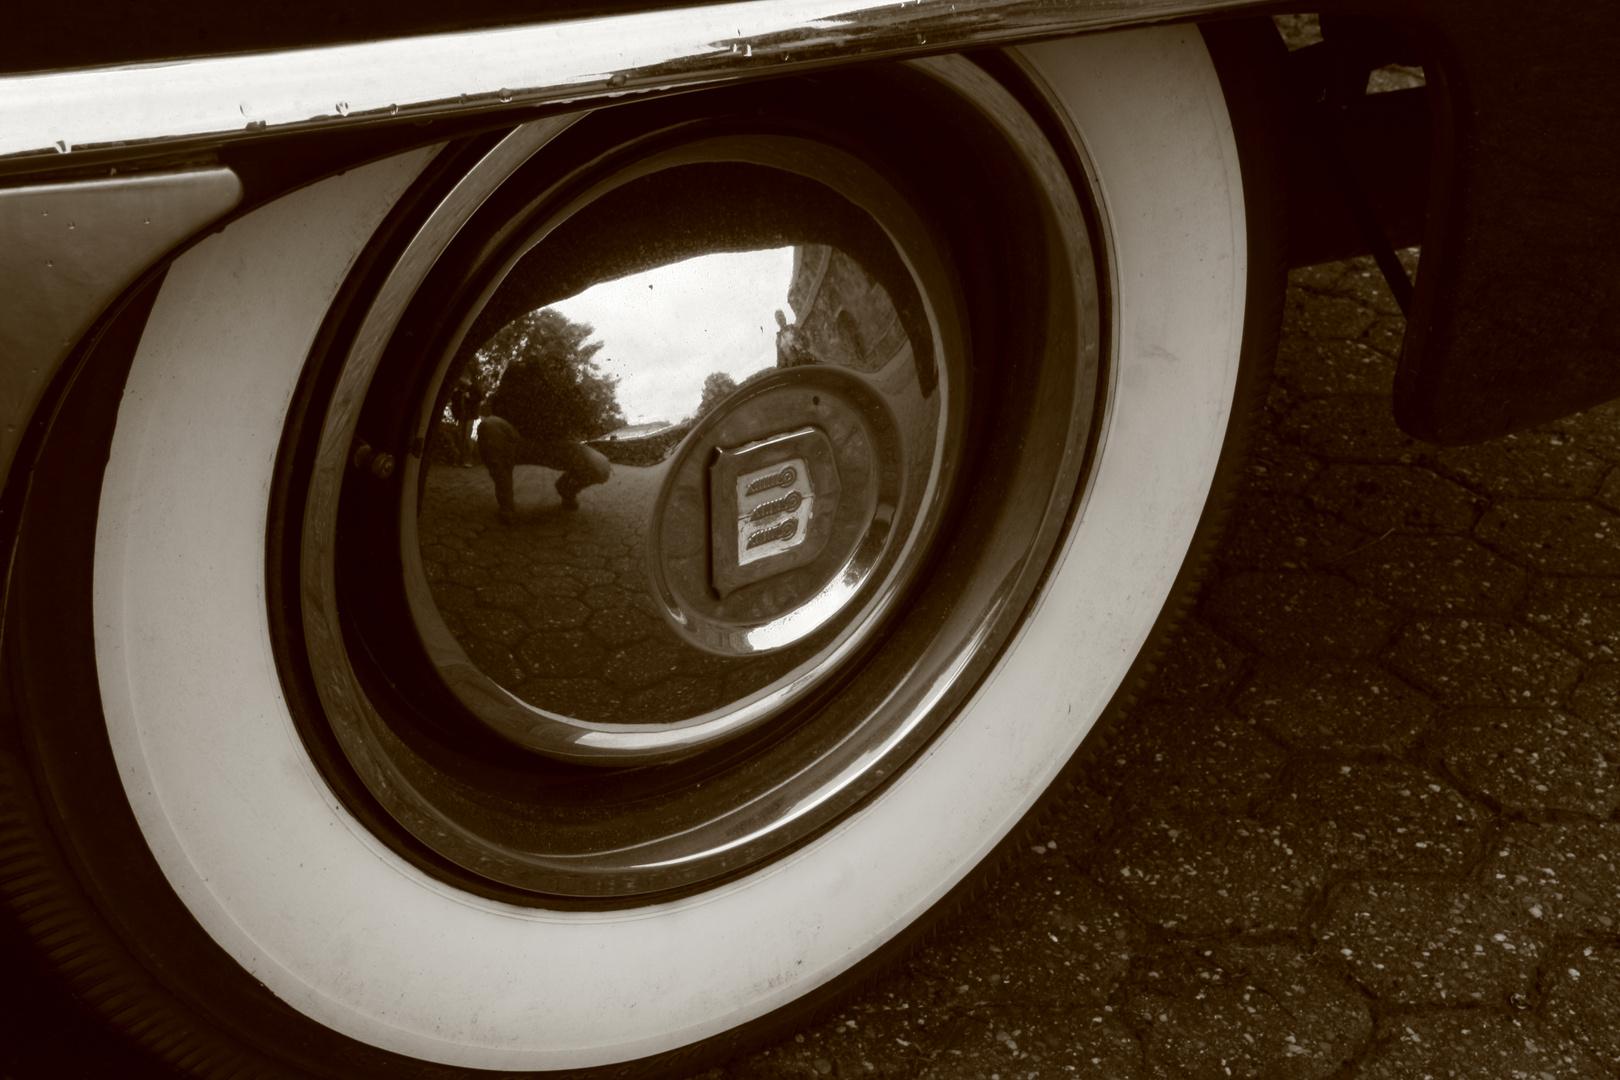 Fotograf oder Auto älter..?! ;-)